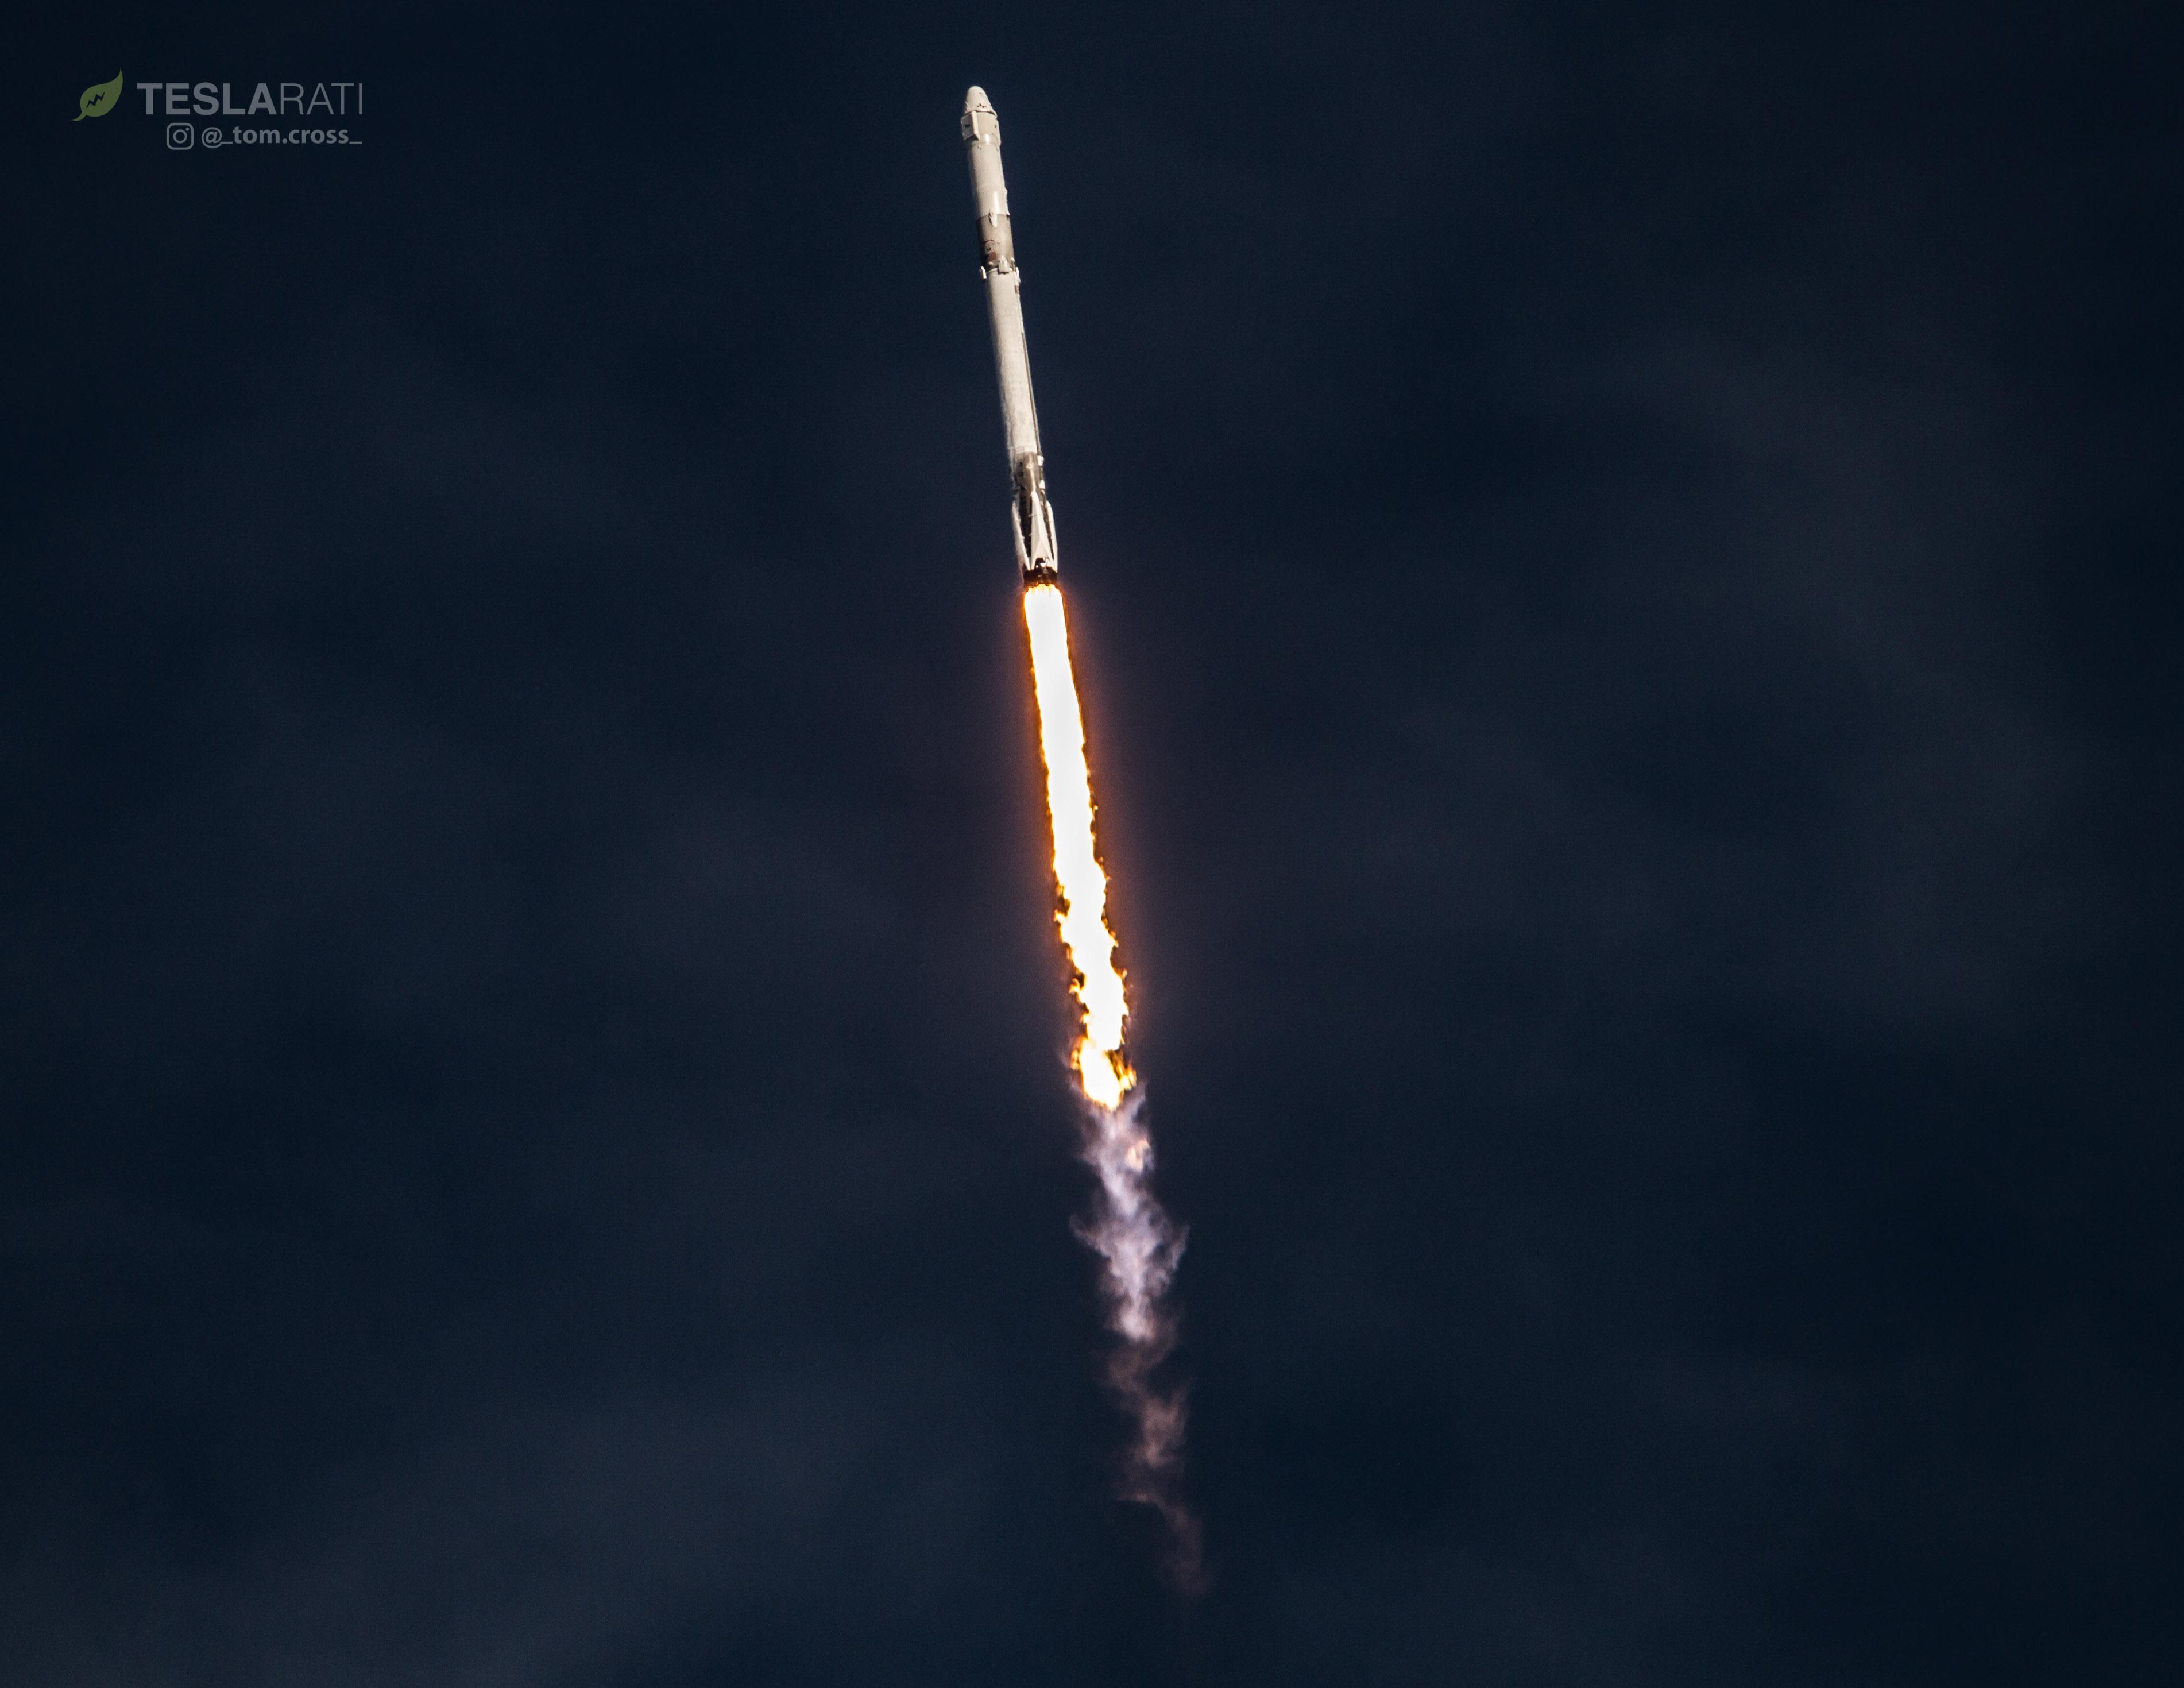 CRS-14 1039 liftoff VAB 4 (Tom Cross)